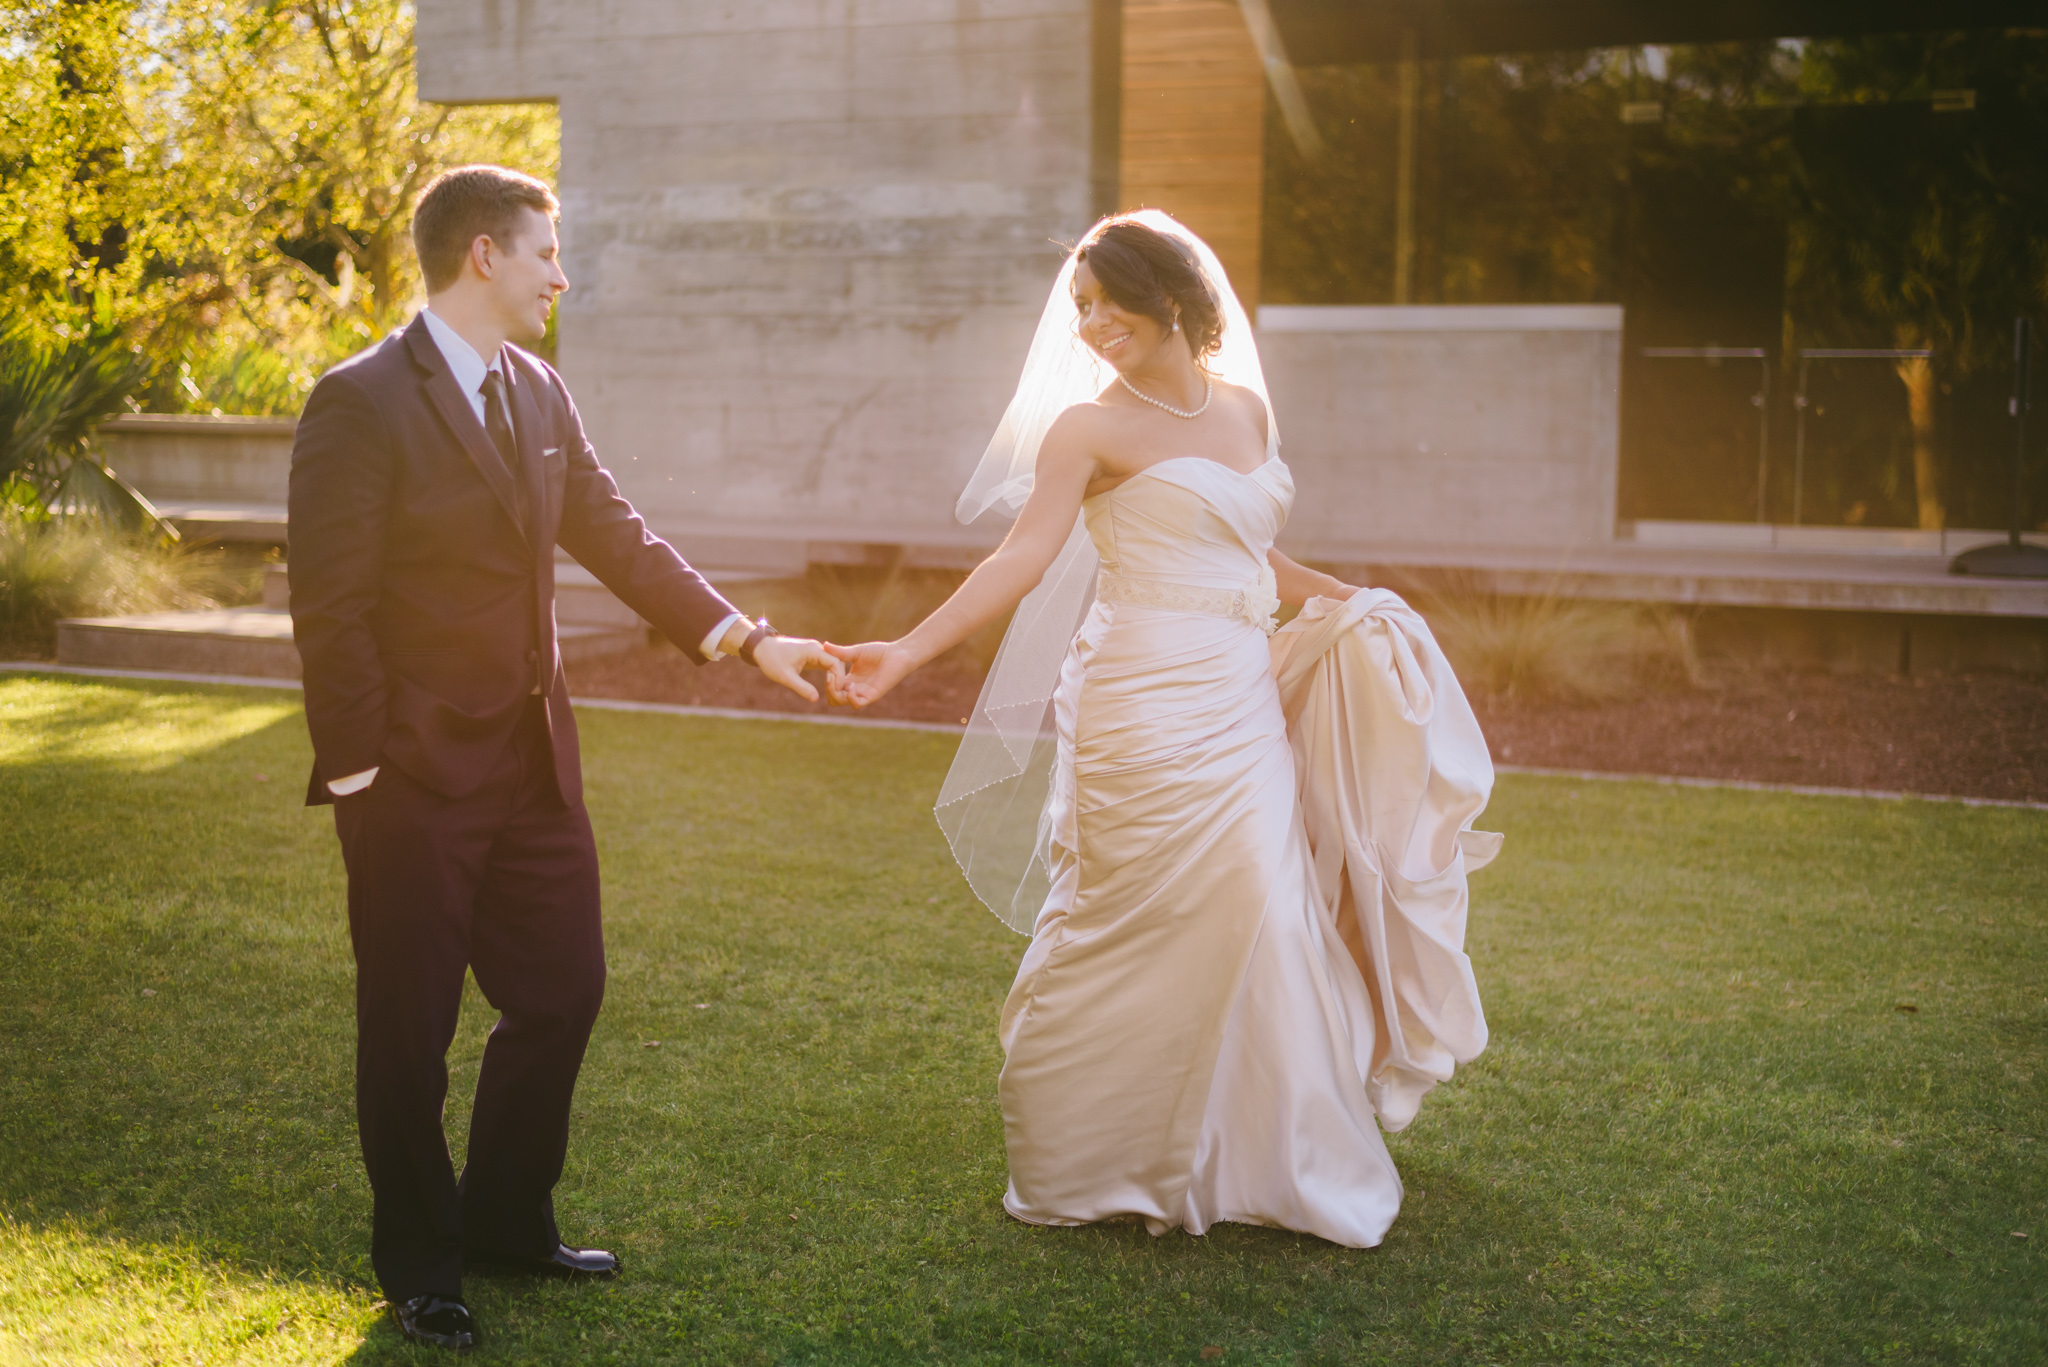 Hozik_Wedding-605.jpg